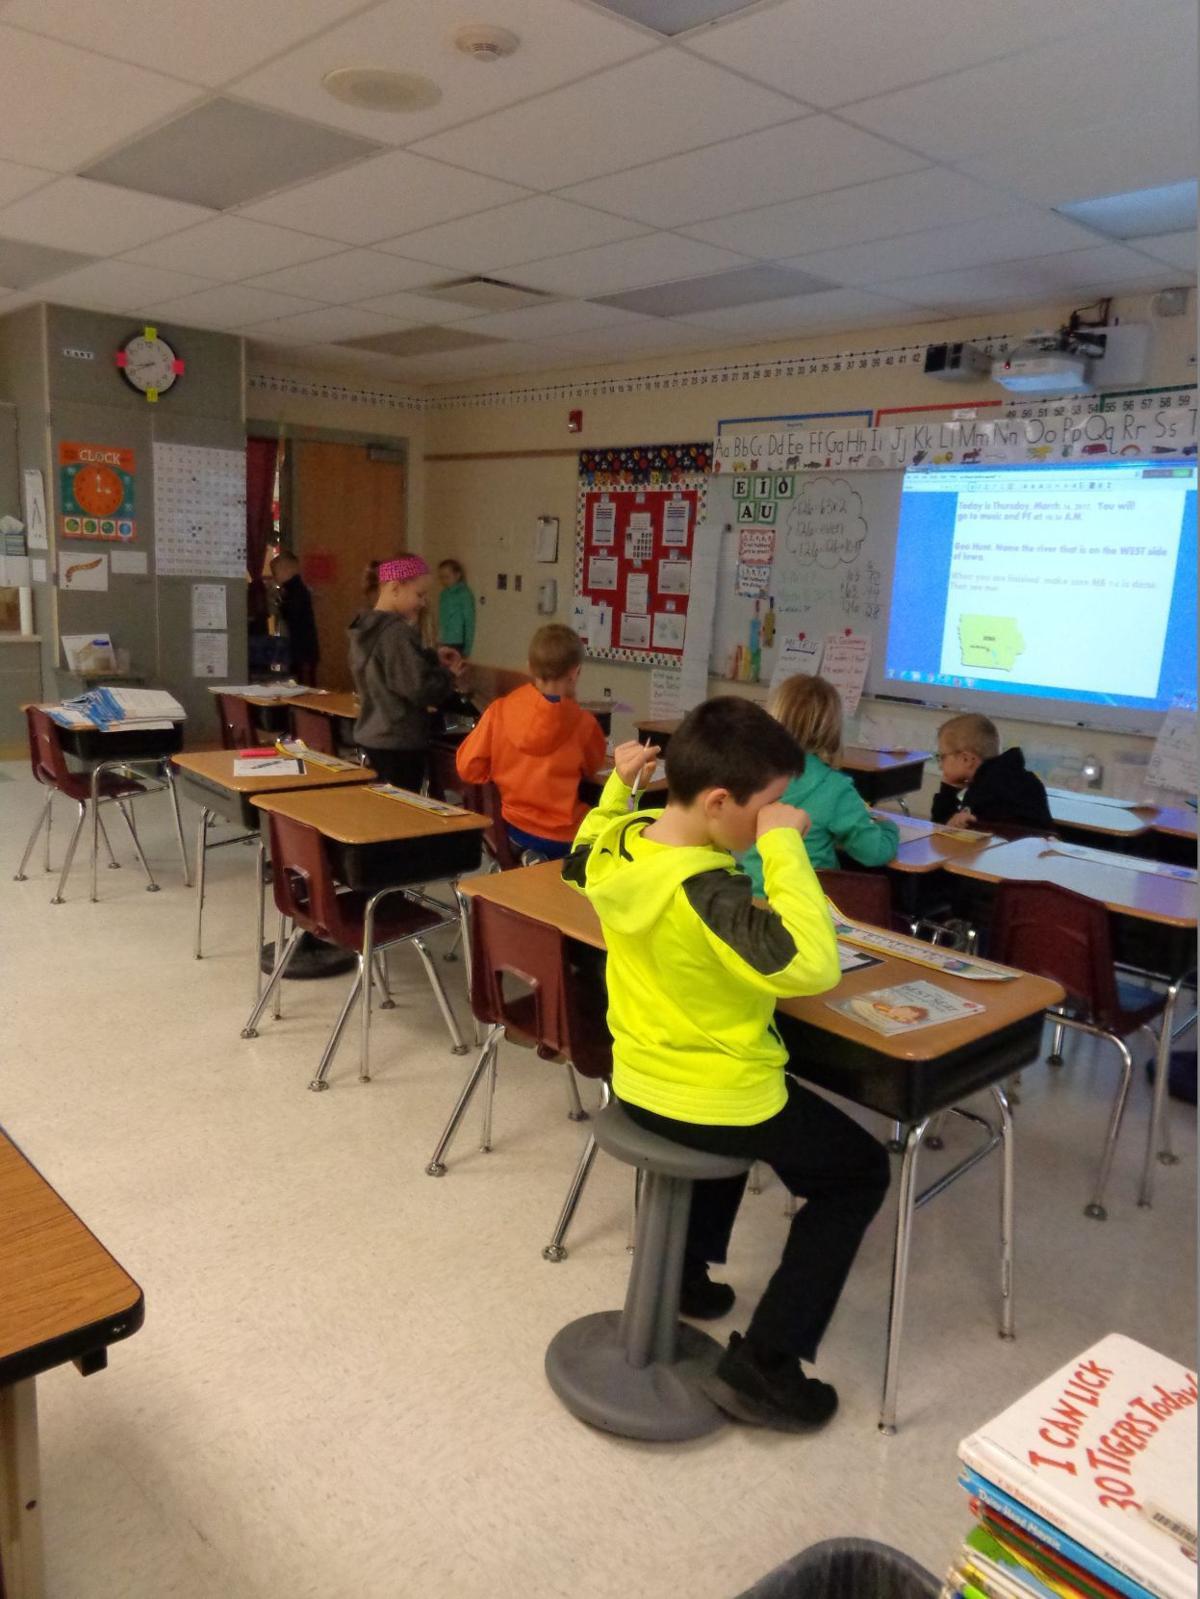 Epworth Elementary Offers Flexible Seating News Cpioneercom